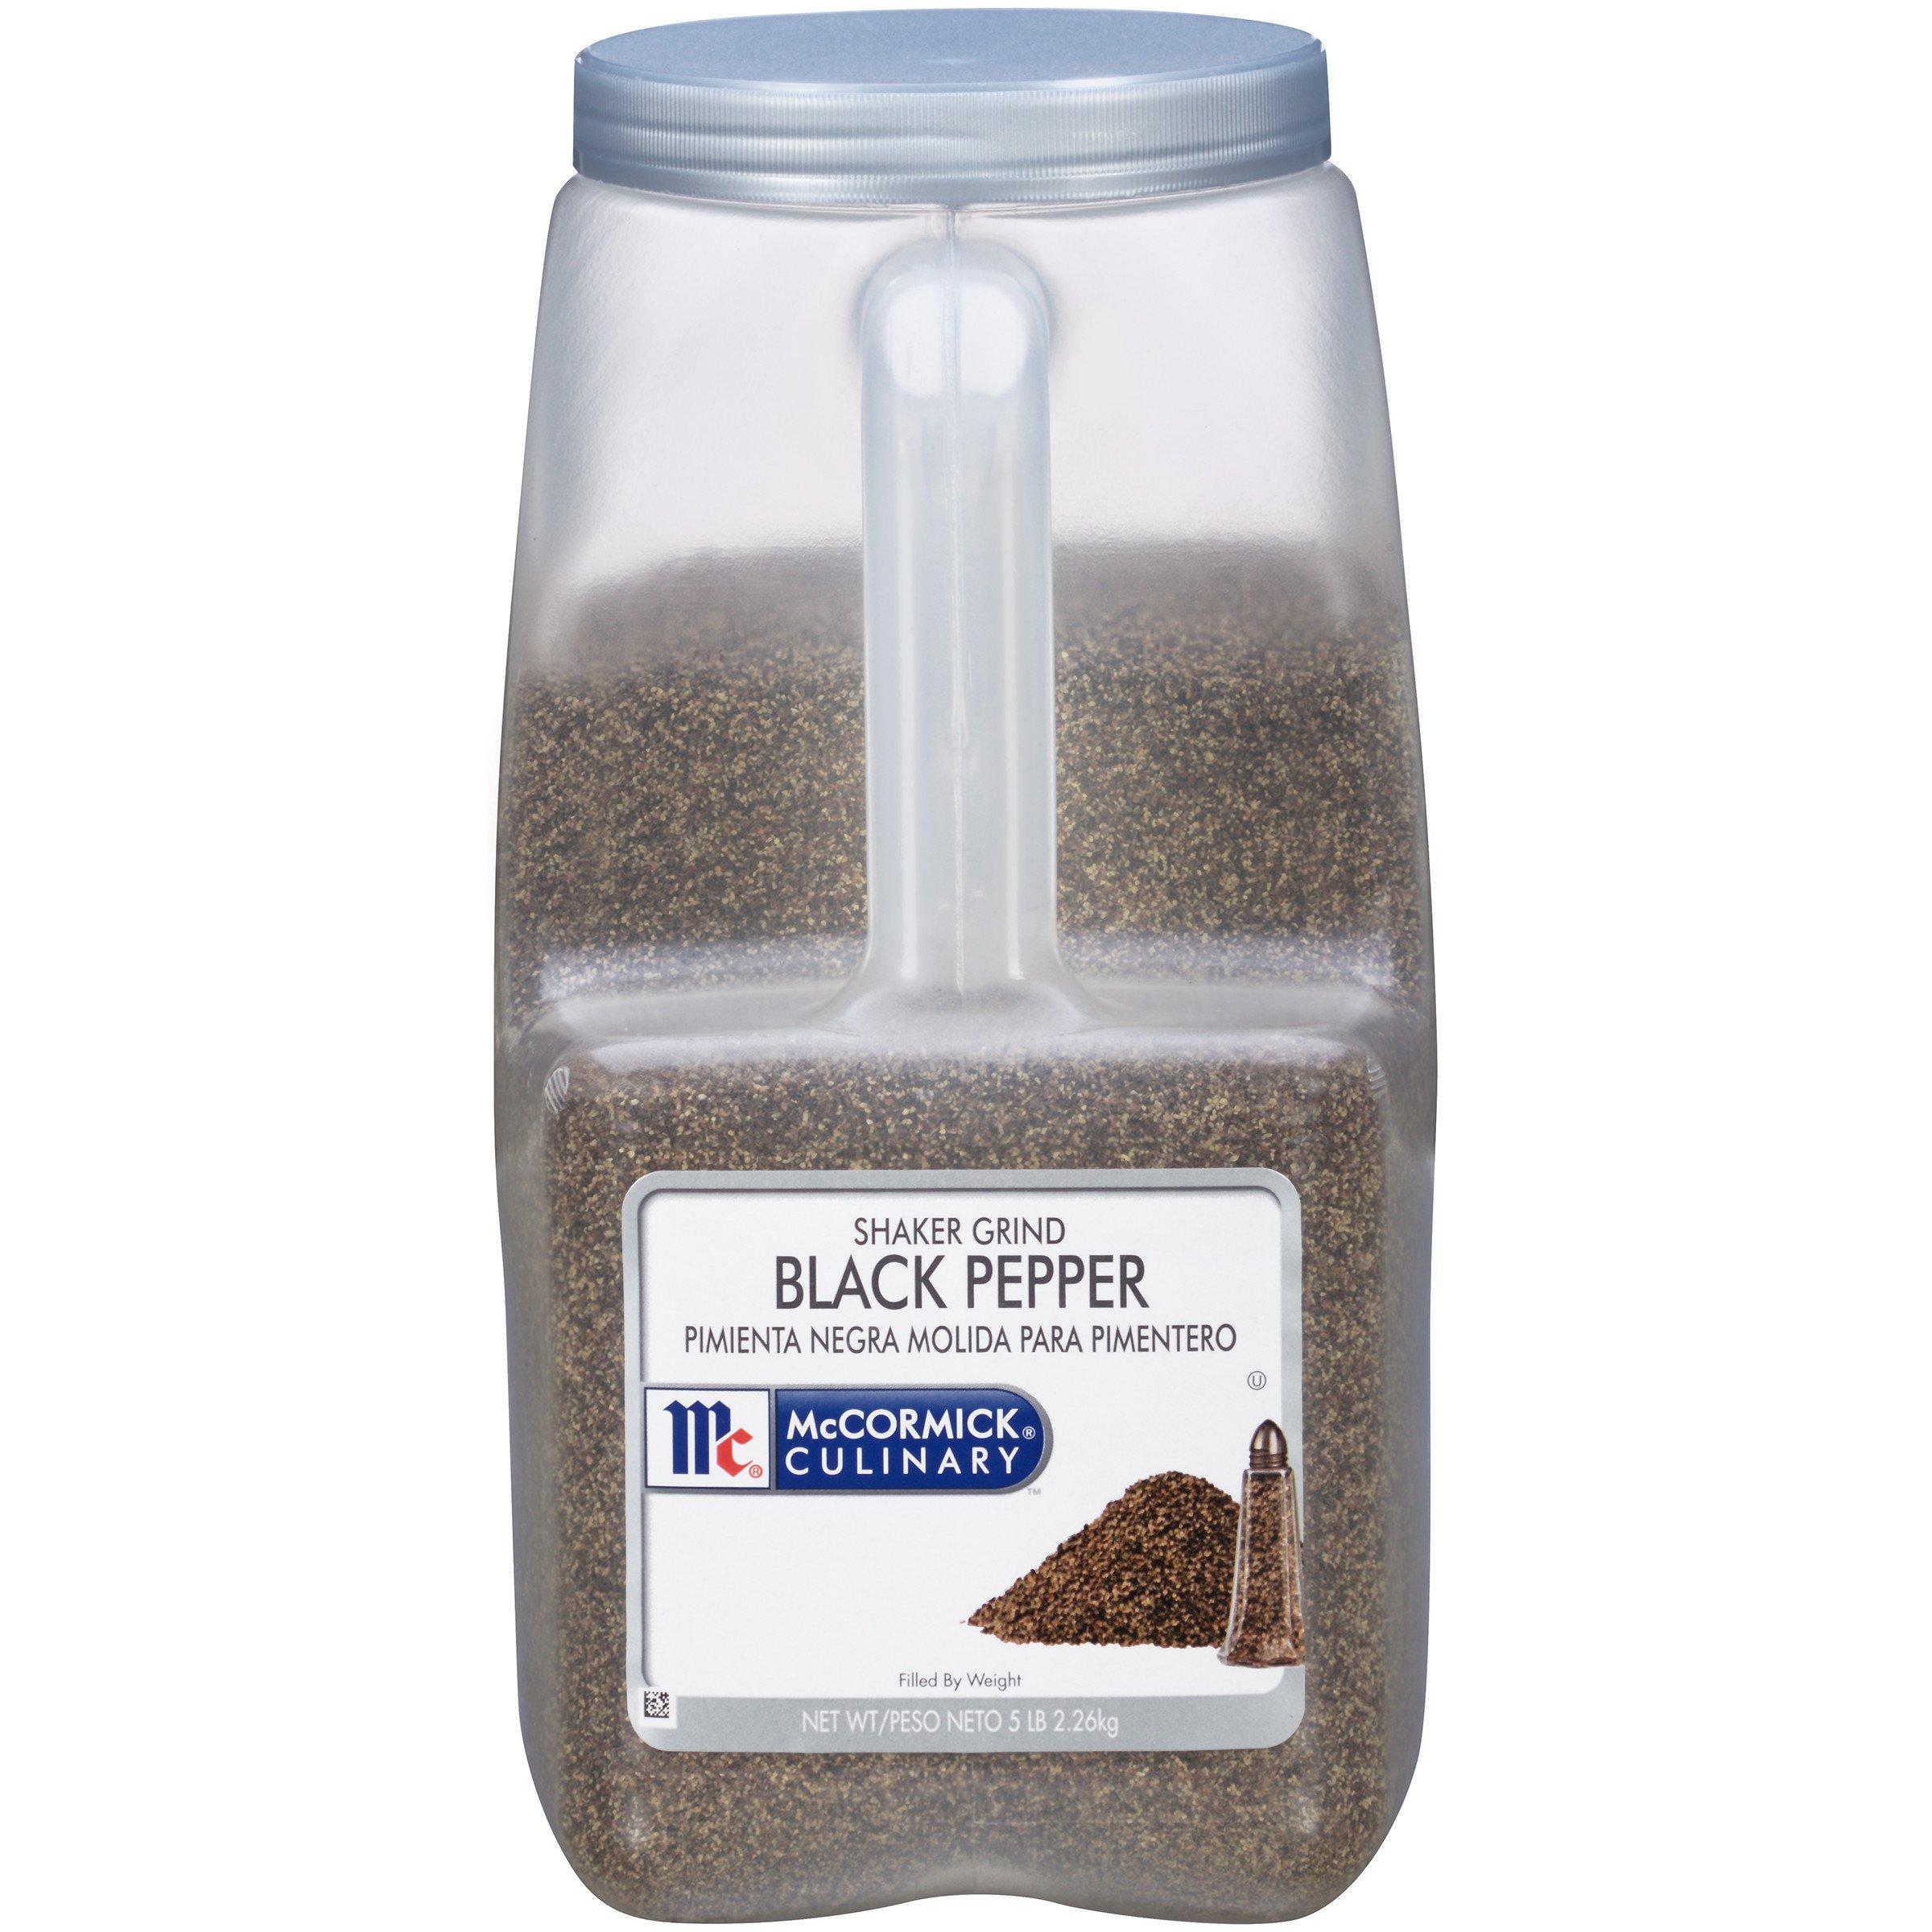 McCormick Culinary Shaker Grind Black Pepper, 5 lbs